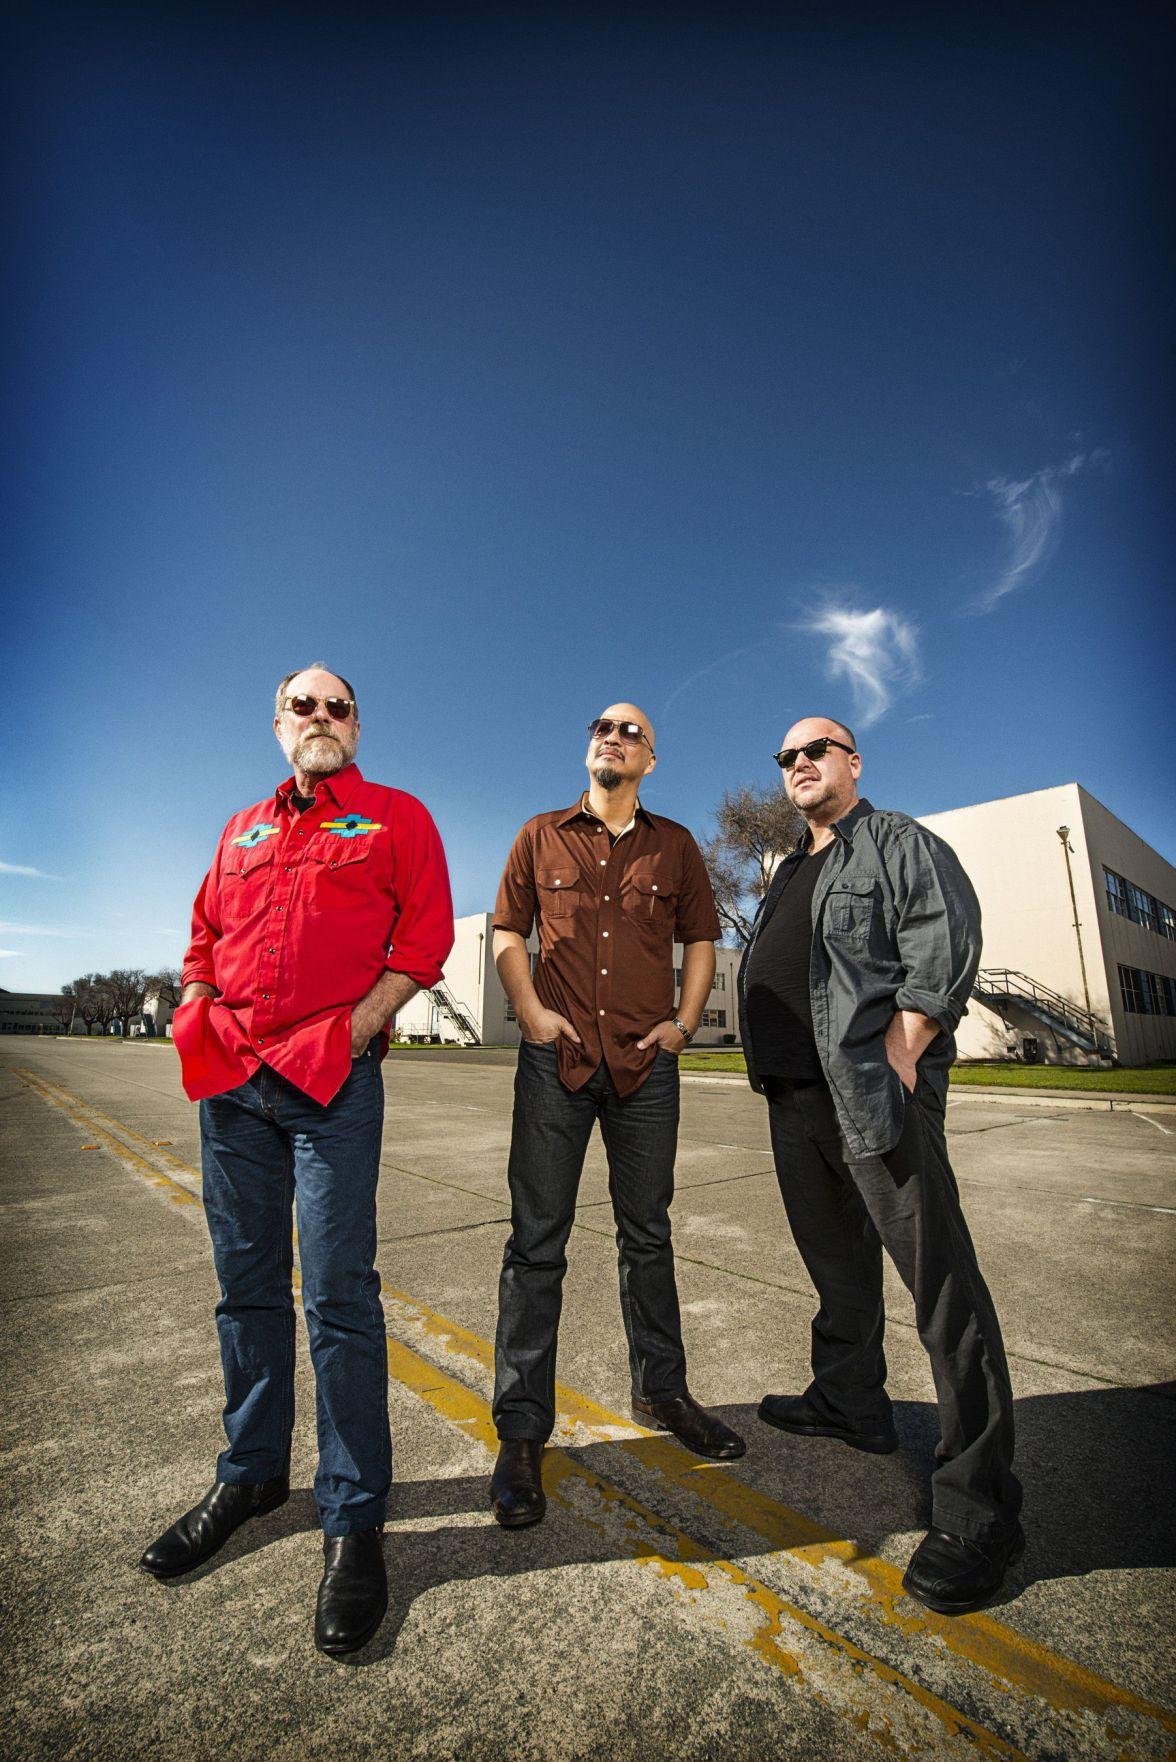 The Pixies showcase timeless music, guitar tricks at North Charleston concert Monday